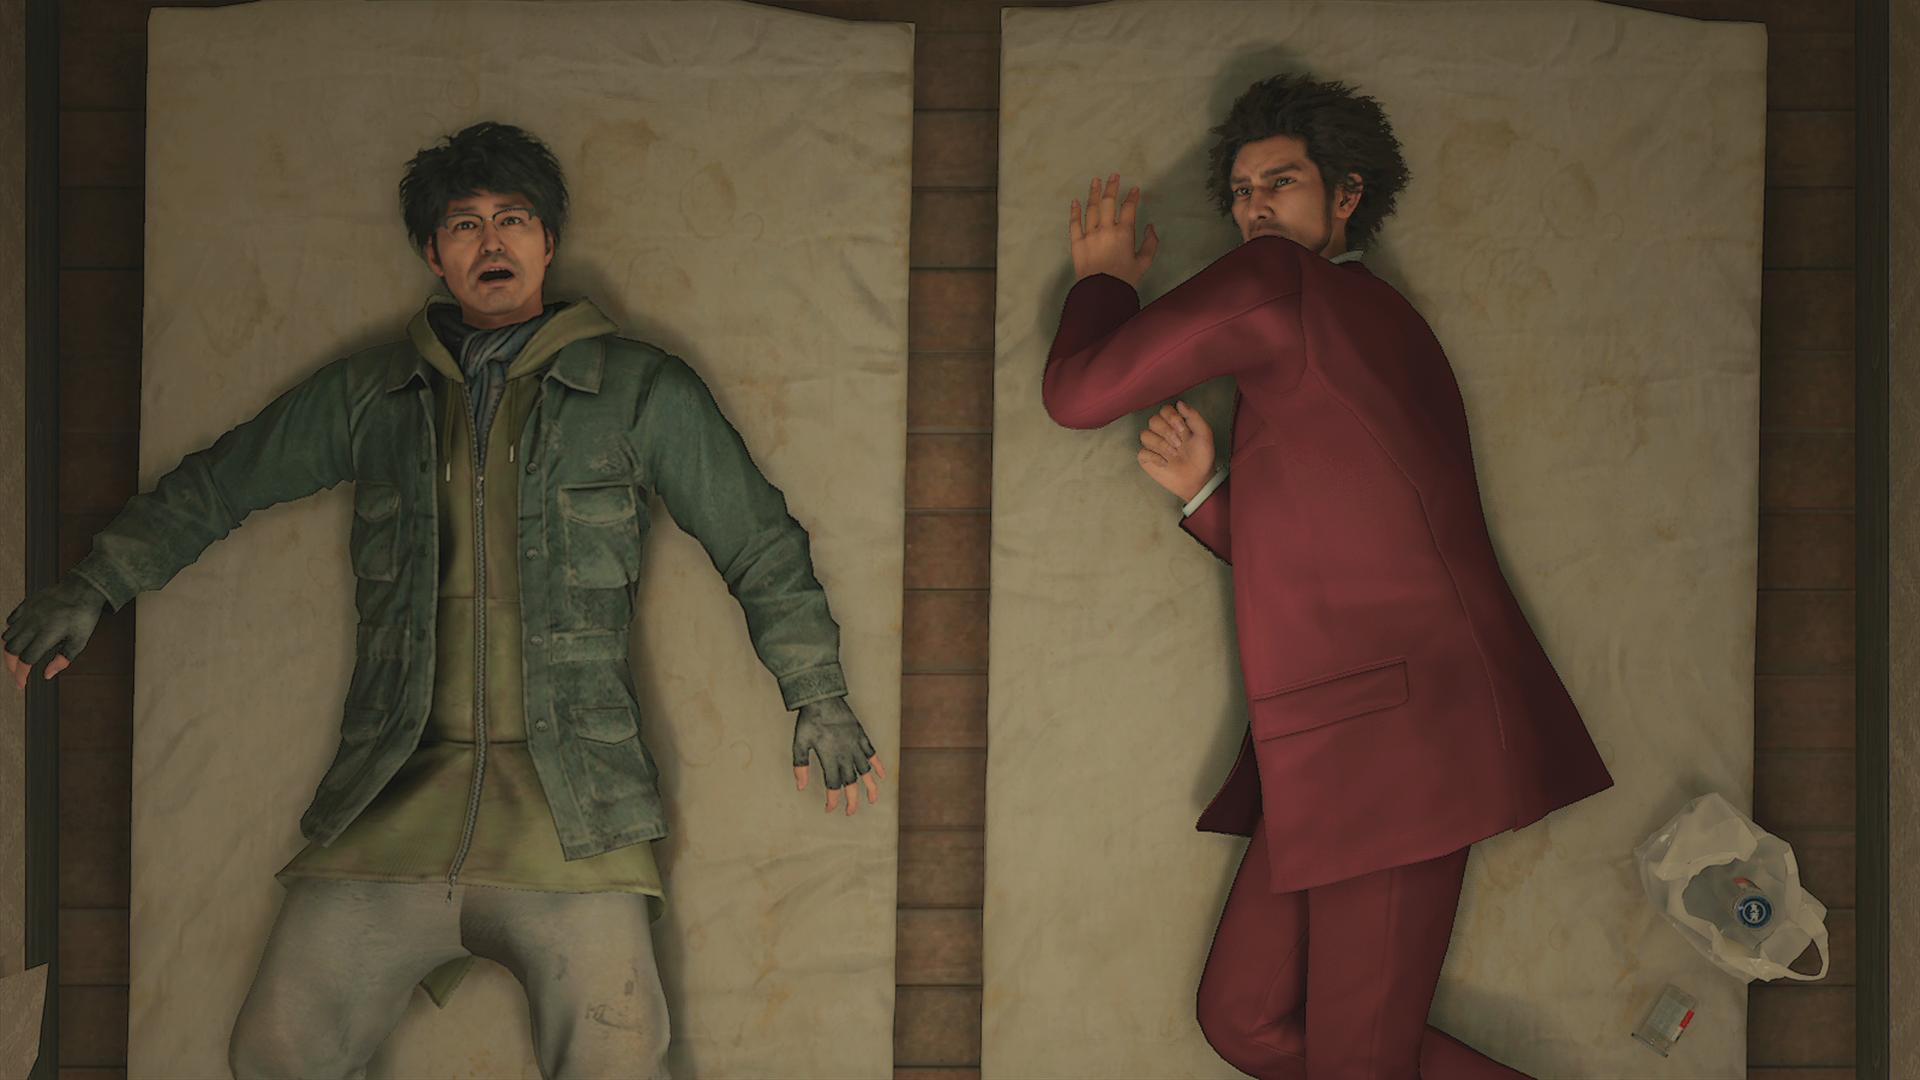 Scene from Yakuza: Like a Dragon, an RPG from SEGA. Ichiban and Nanba are sleeping on futon.